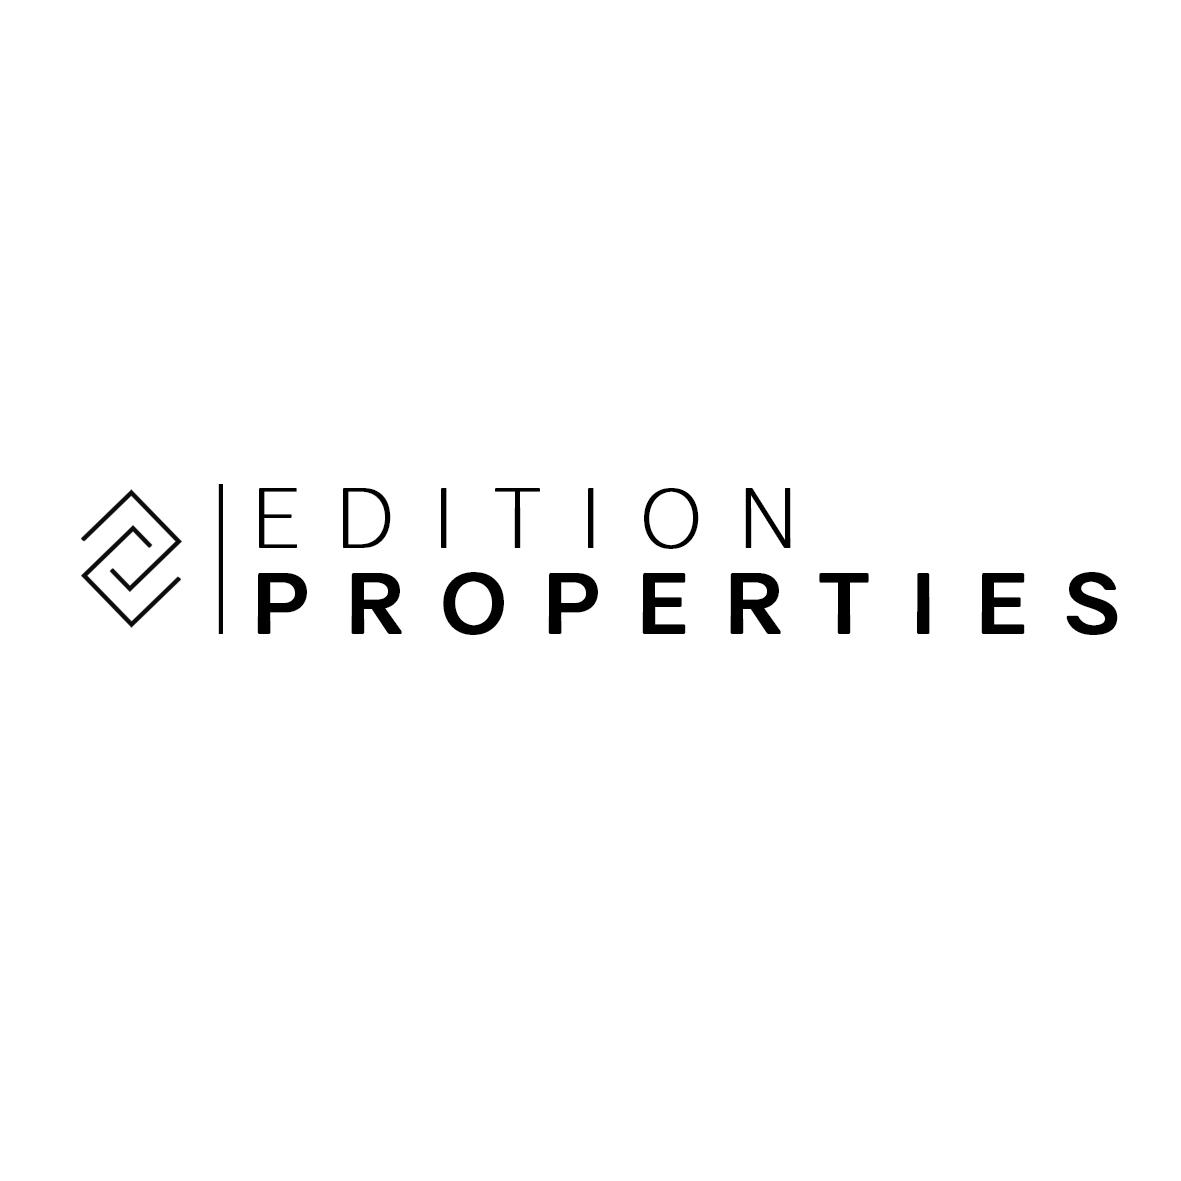 Edition Properties